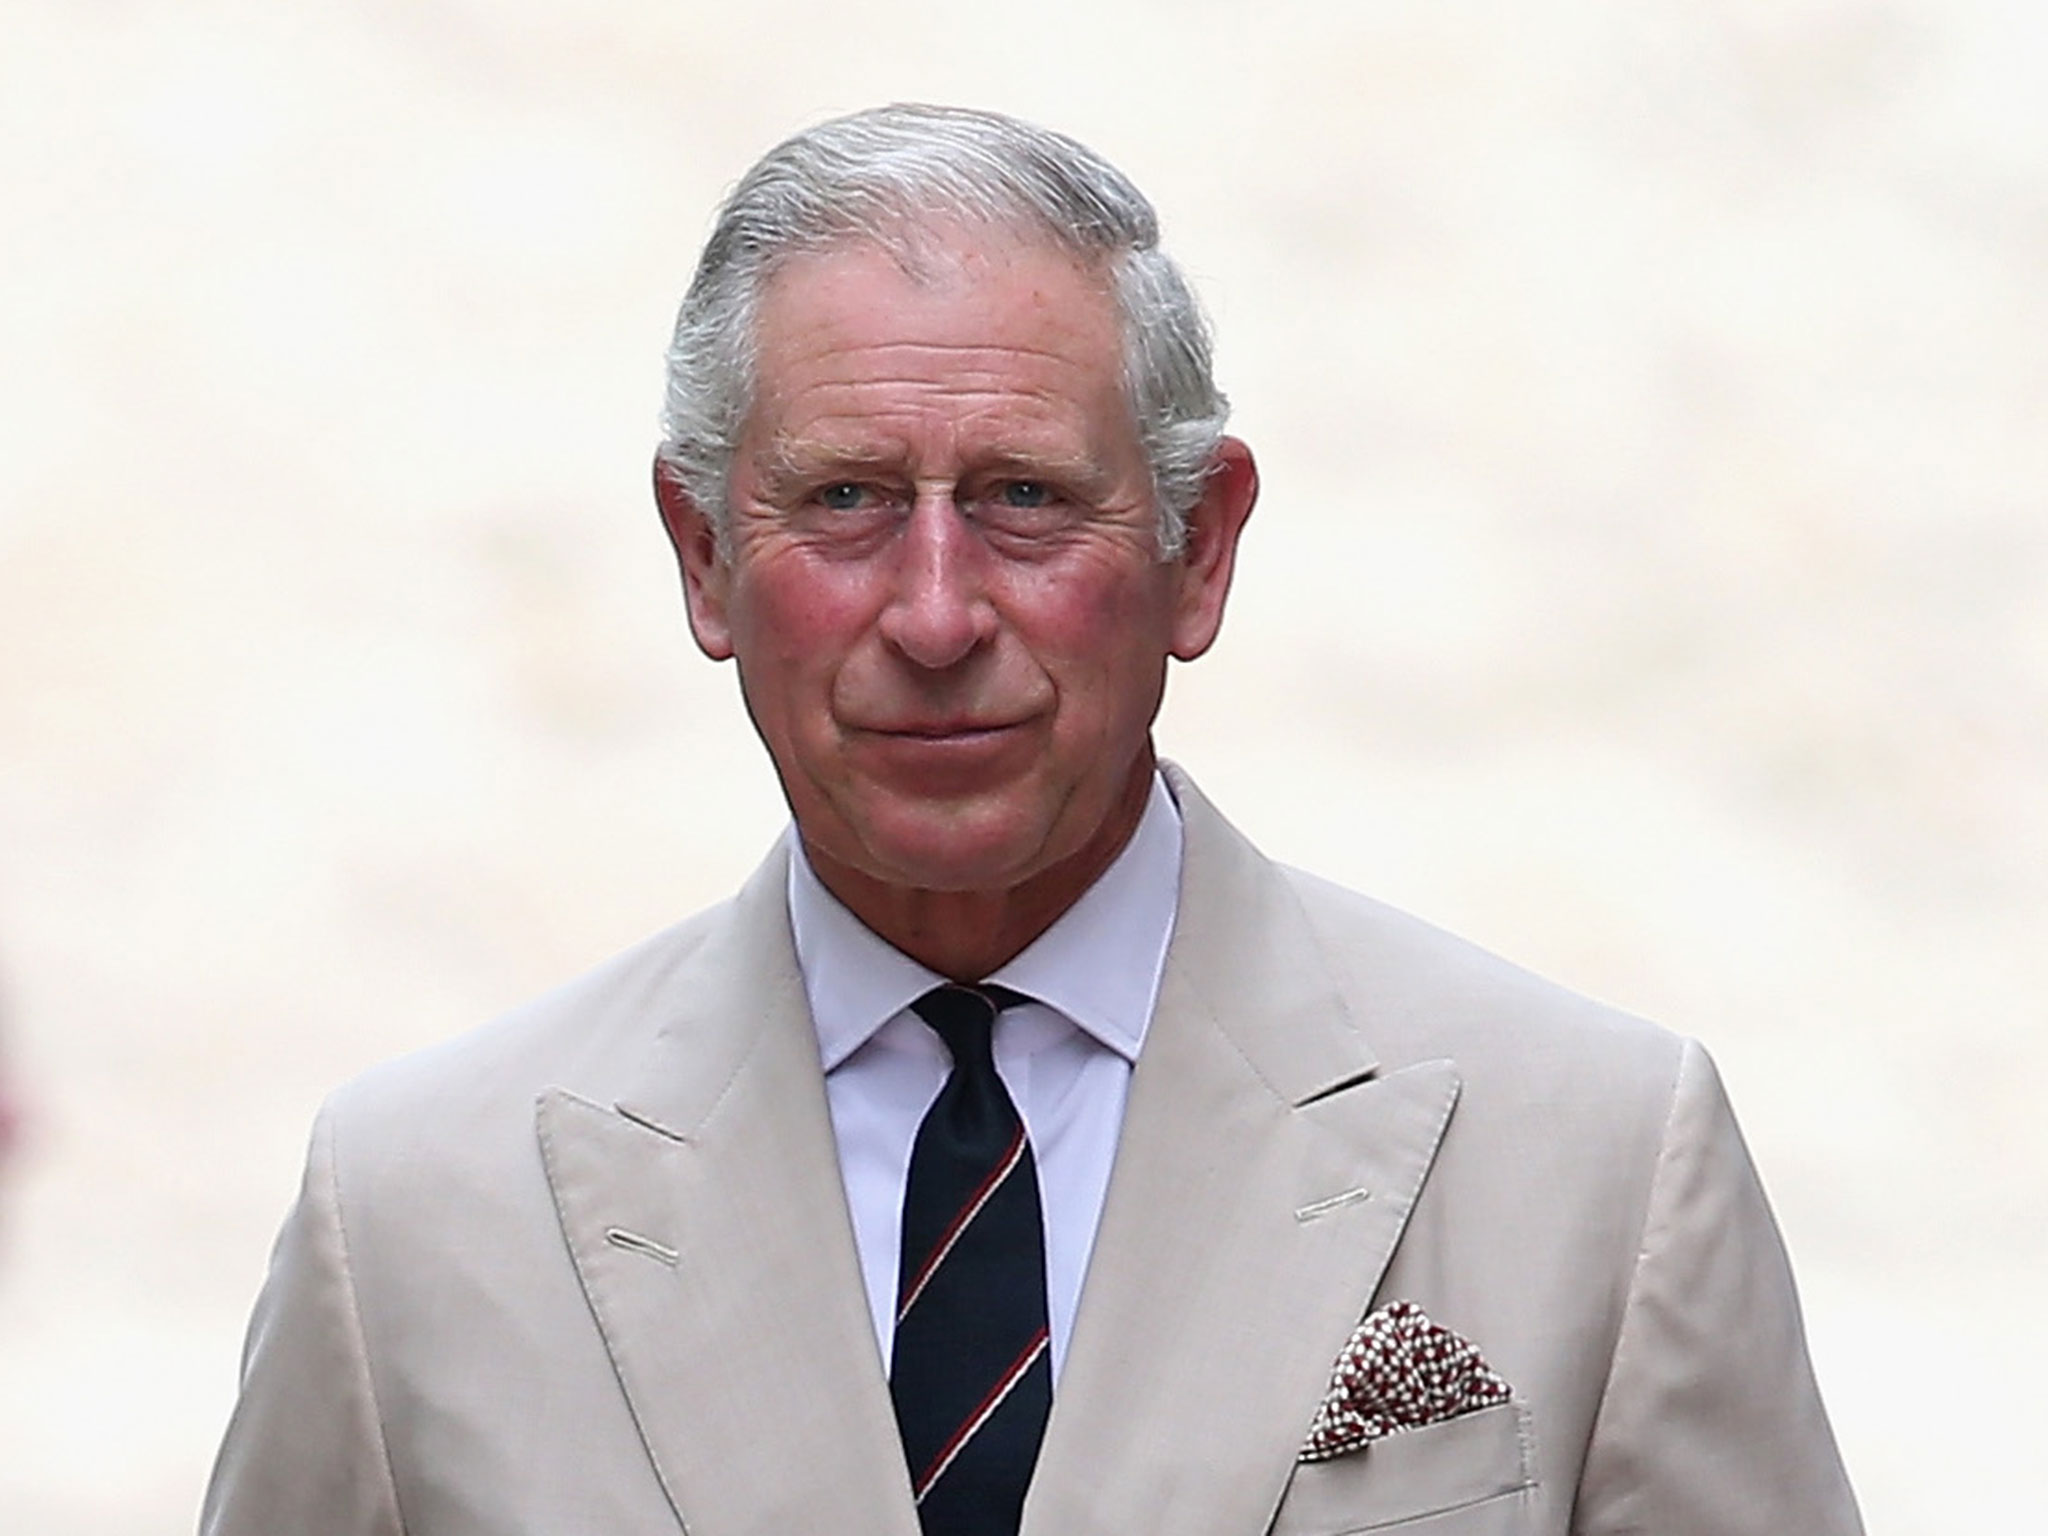 Prince of Wales Prince Charles - age: 73